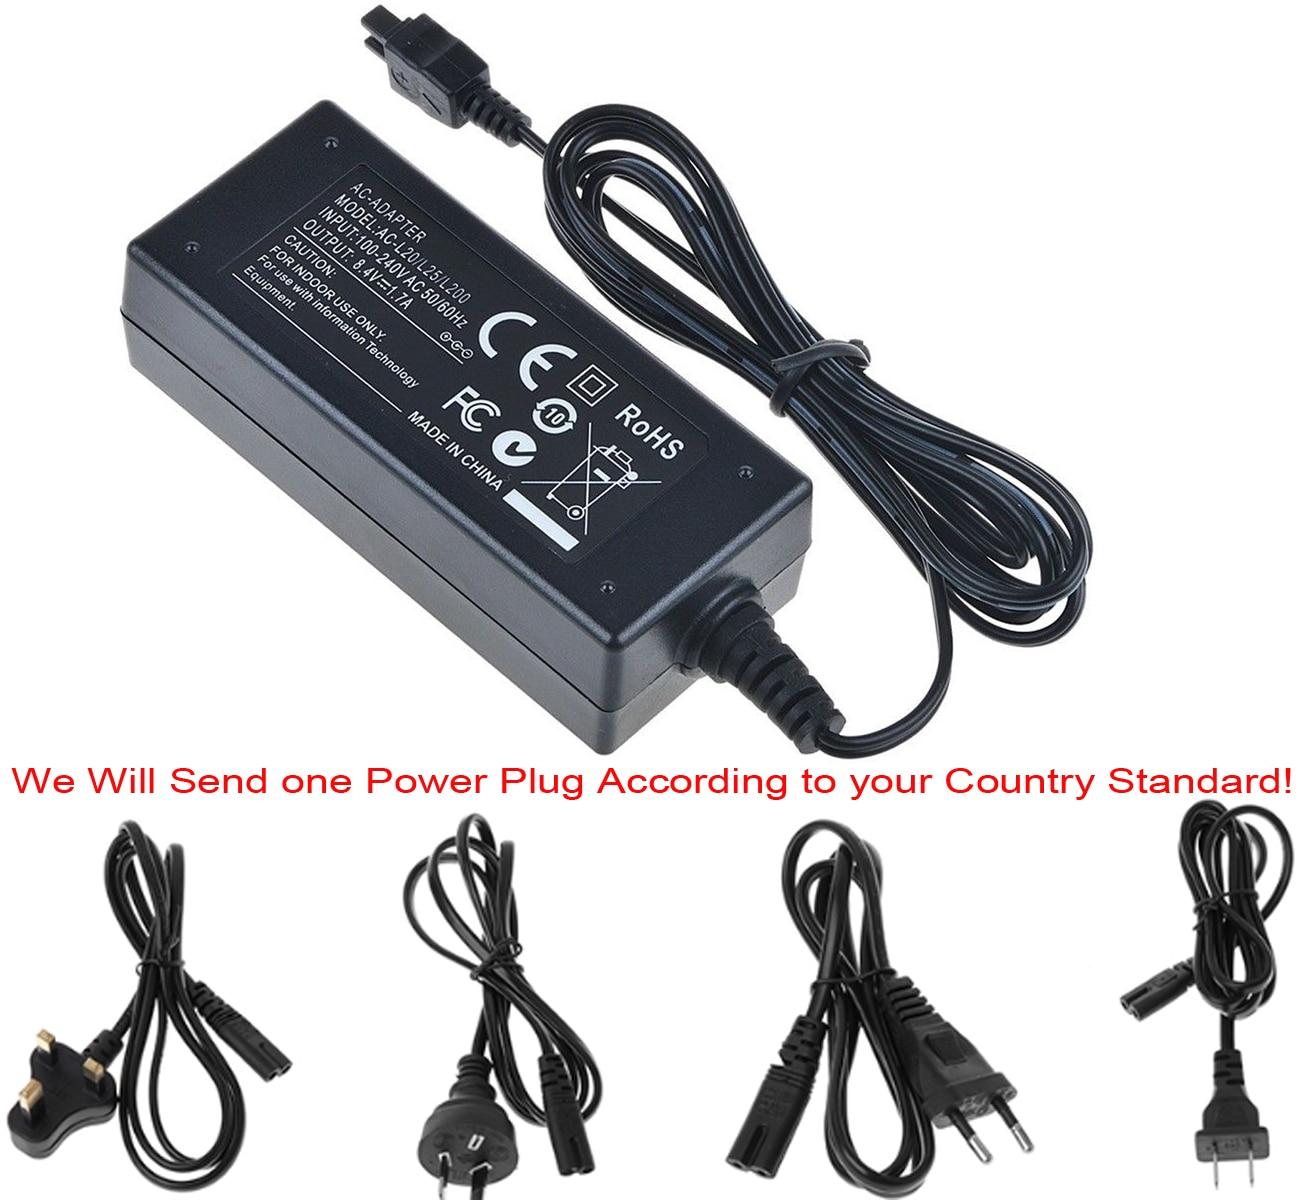 AC Cargador/adaptador de corriente para Sony DCR-HC16E... DCR-HC17E... DCR-HC18E... DCR-HC19E... DCR-HC39E... DCR-HC94E... DCR-HC96E Cámaras grabadoras Handycam